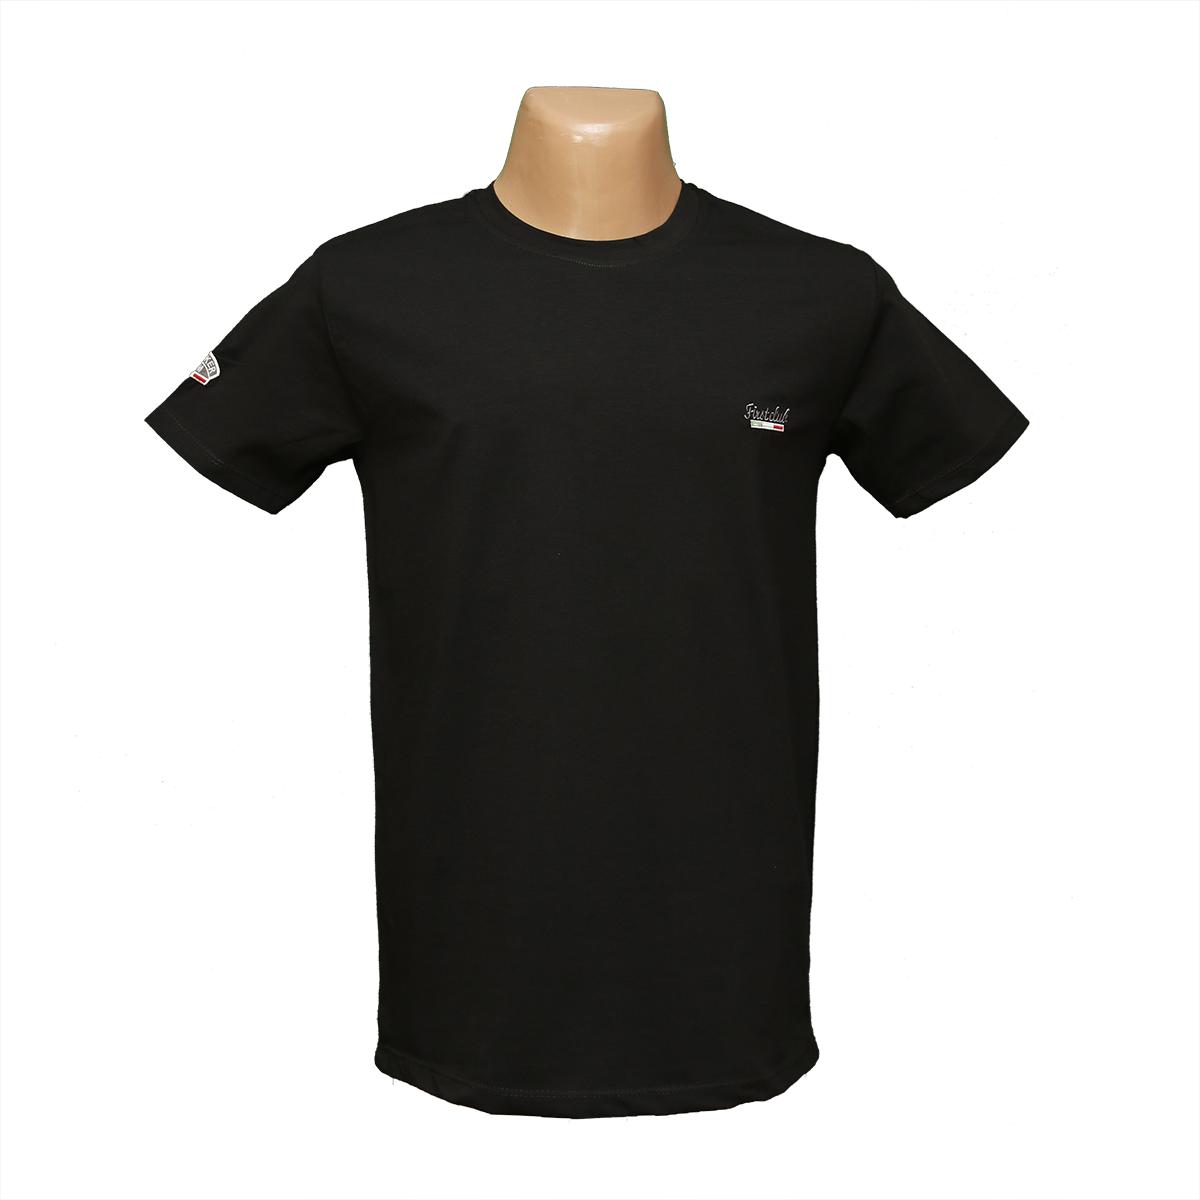 Мужская стрейчевая футболка Lycra тм. BY Walker. пр-во Турция 4035-5